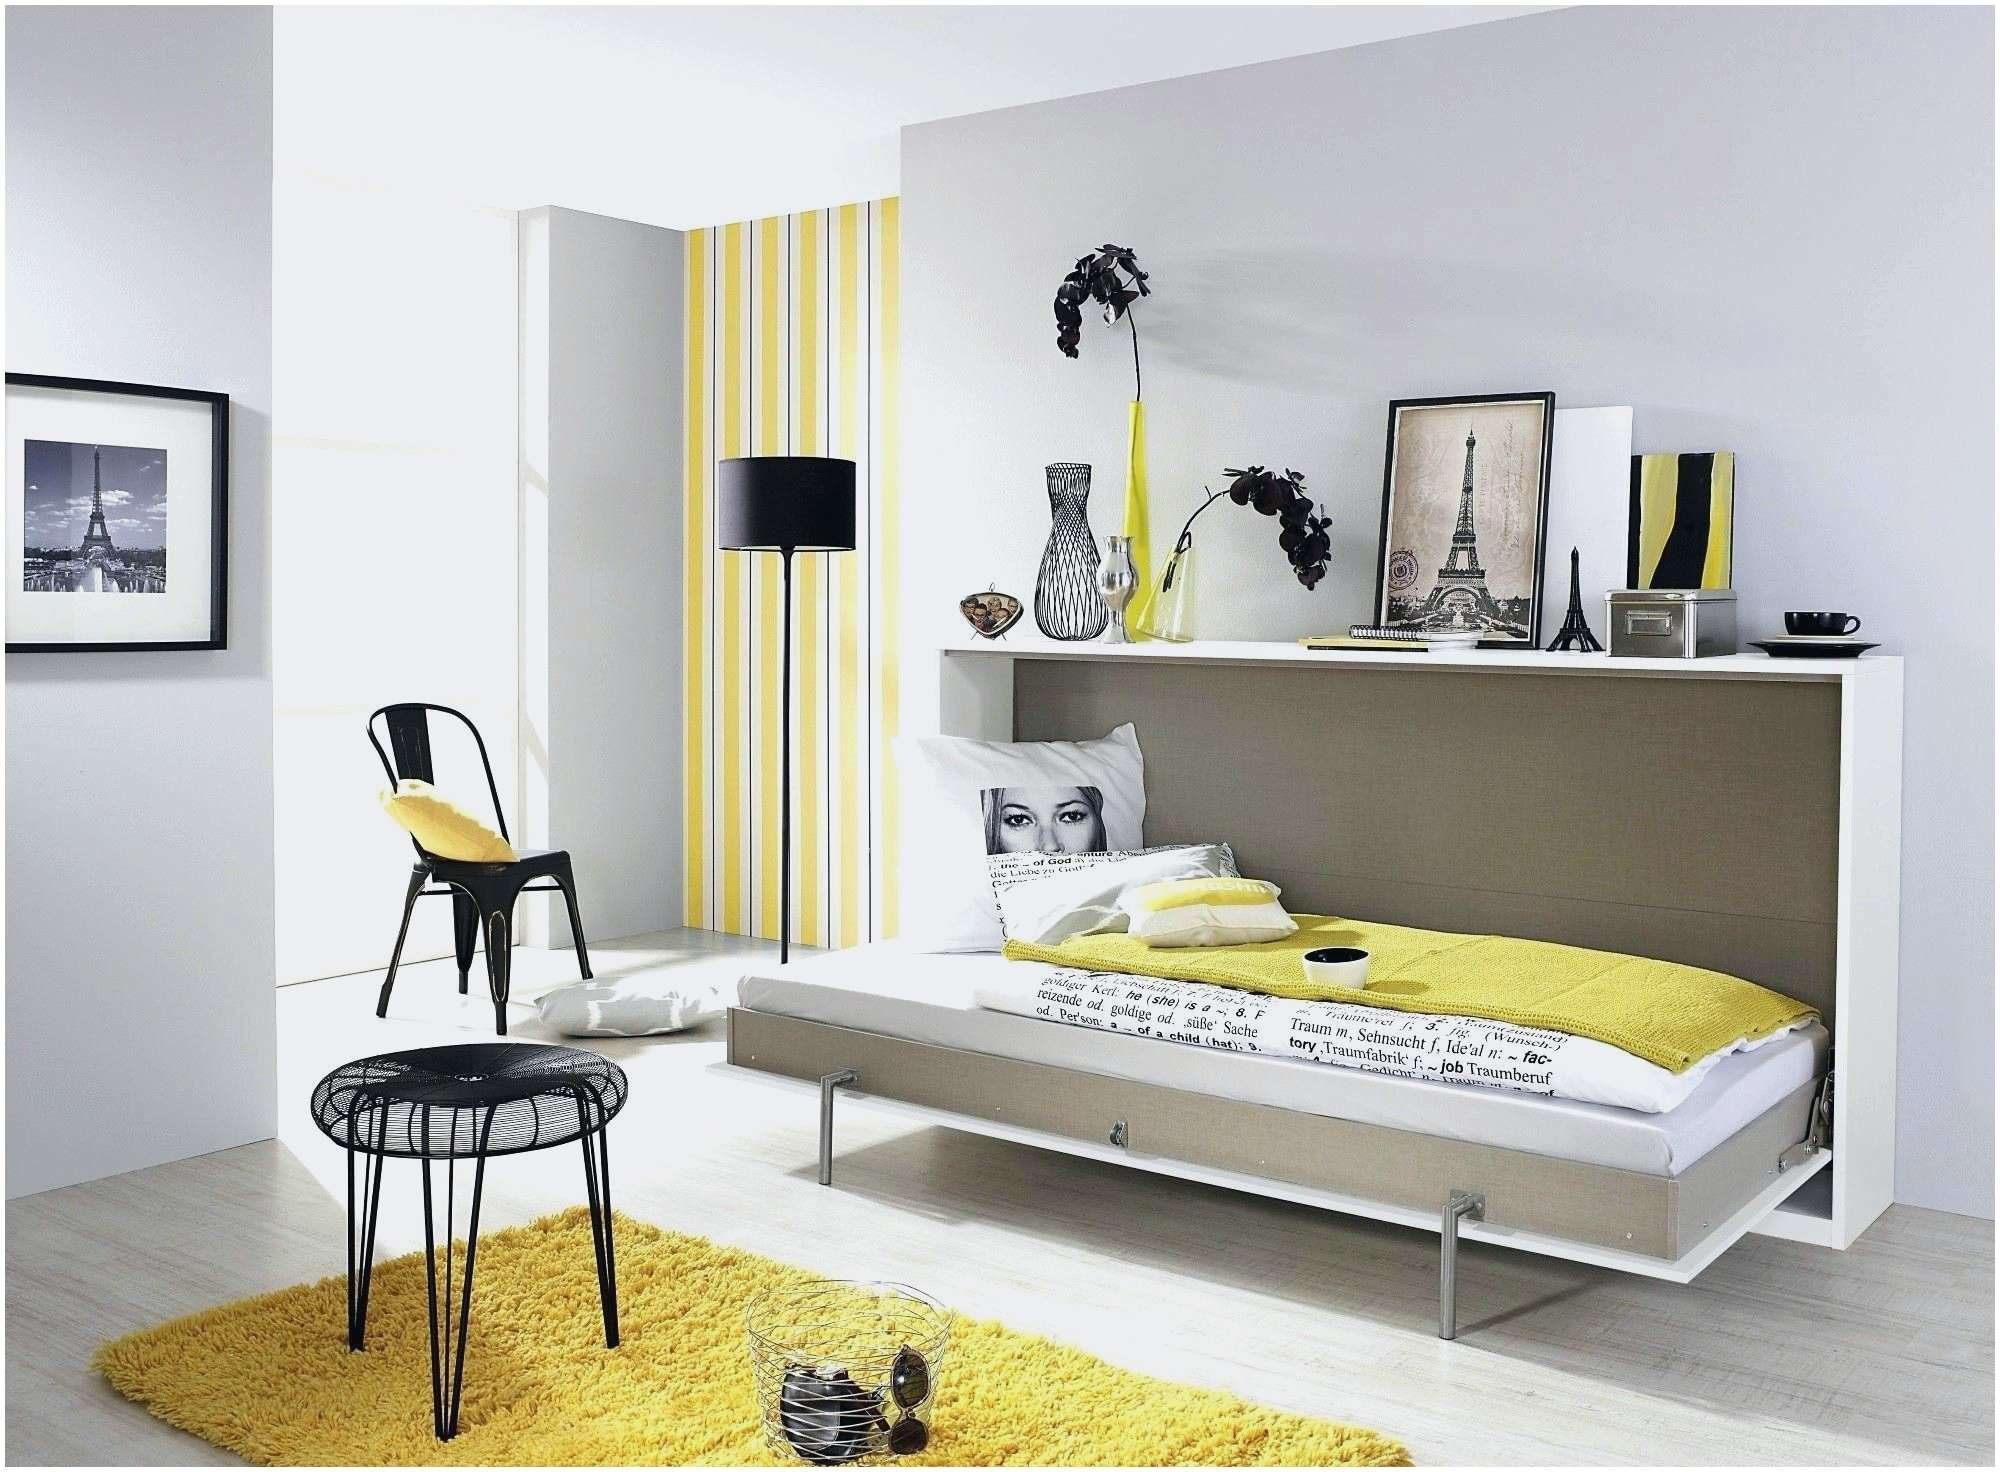 Parure Lit 90×190 Joli Luxe Armoire Graphic Conforama Luxury Lit Placard Conforama Armoire